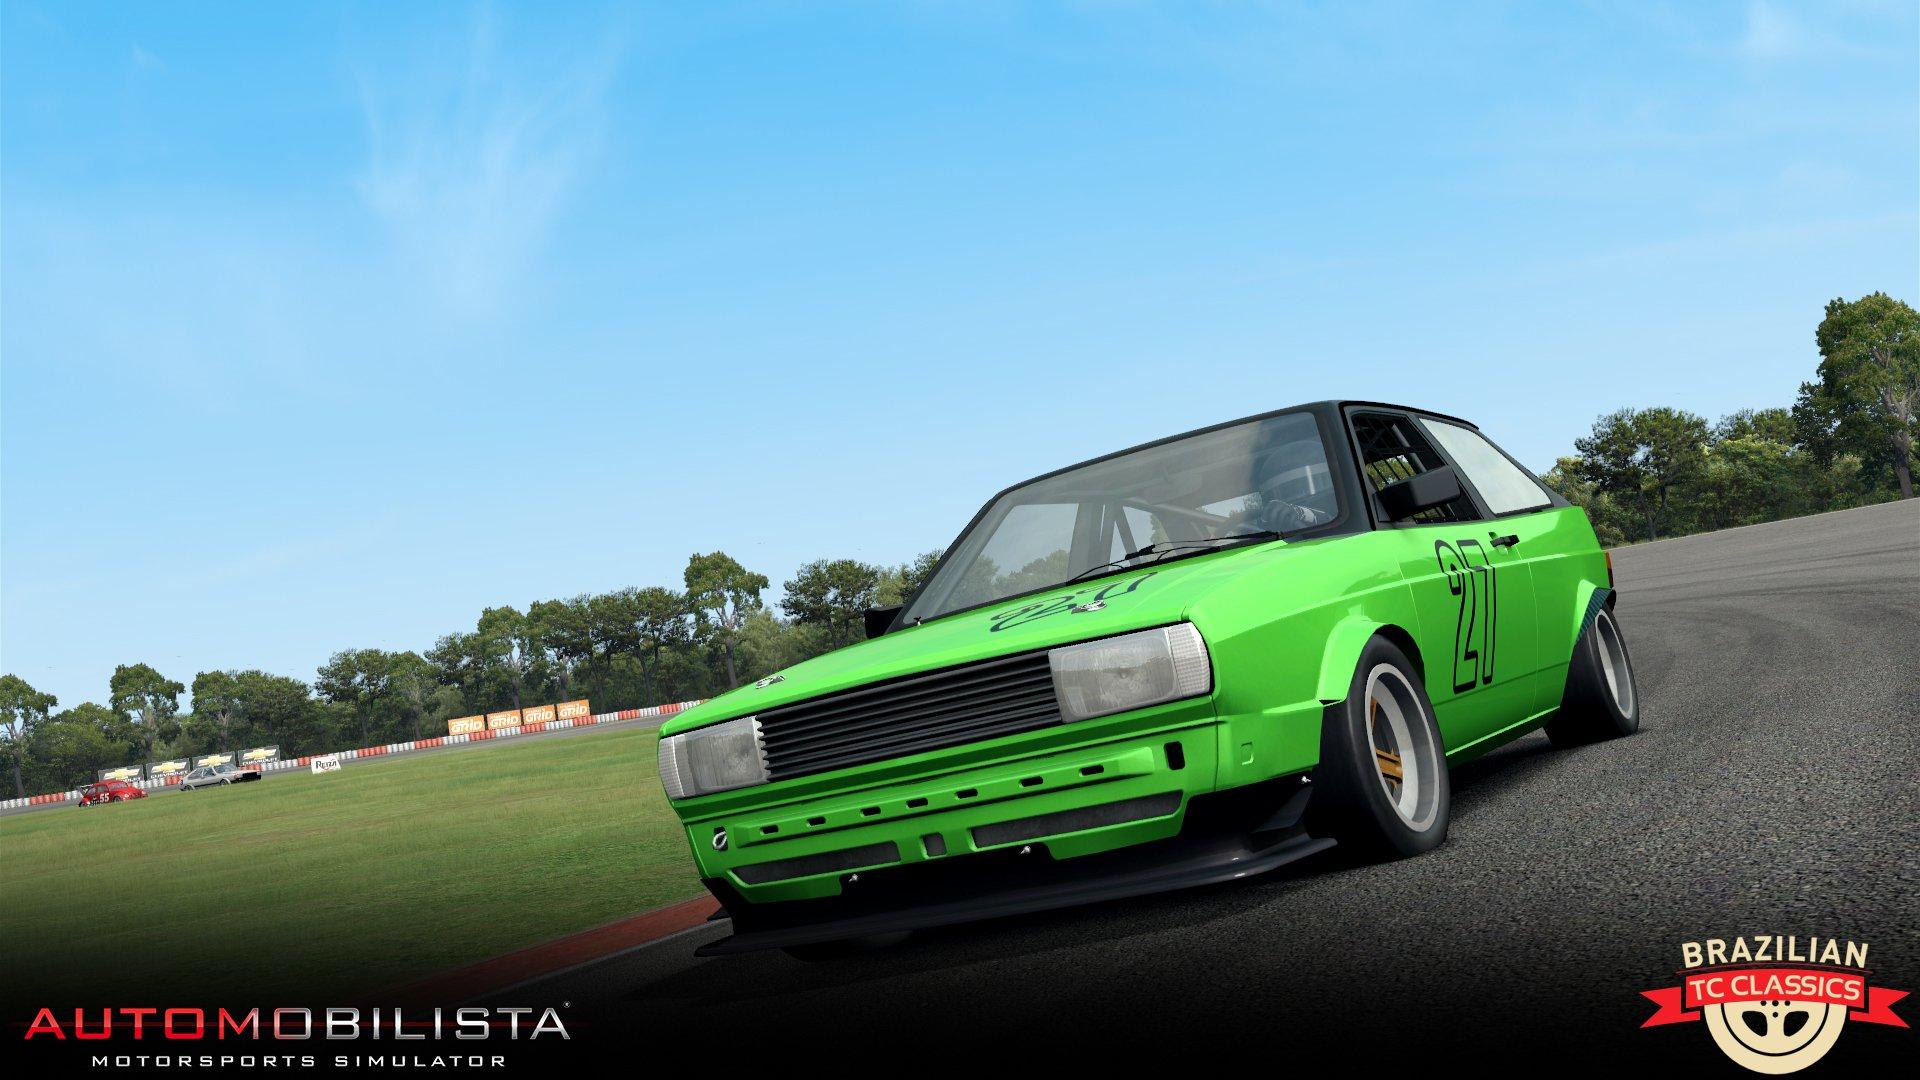 Automobilista Brazilian Touring Car Classics Steam Screenshot 2